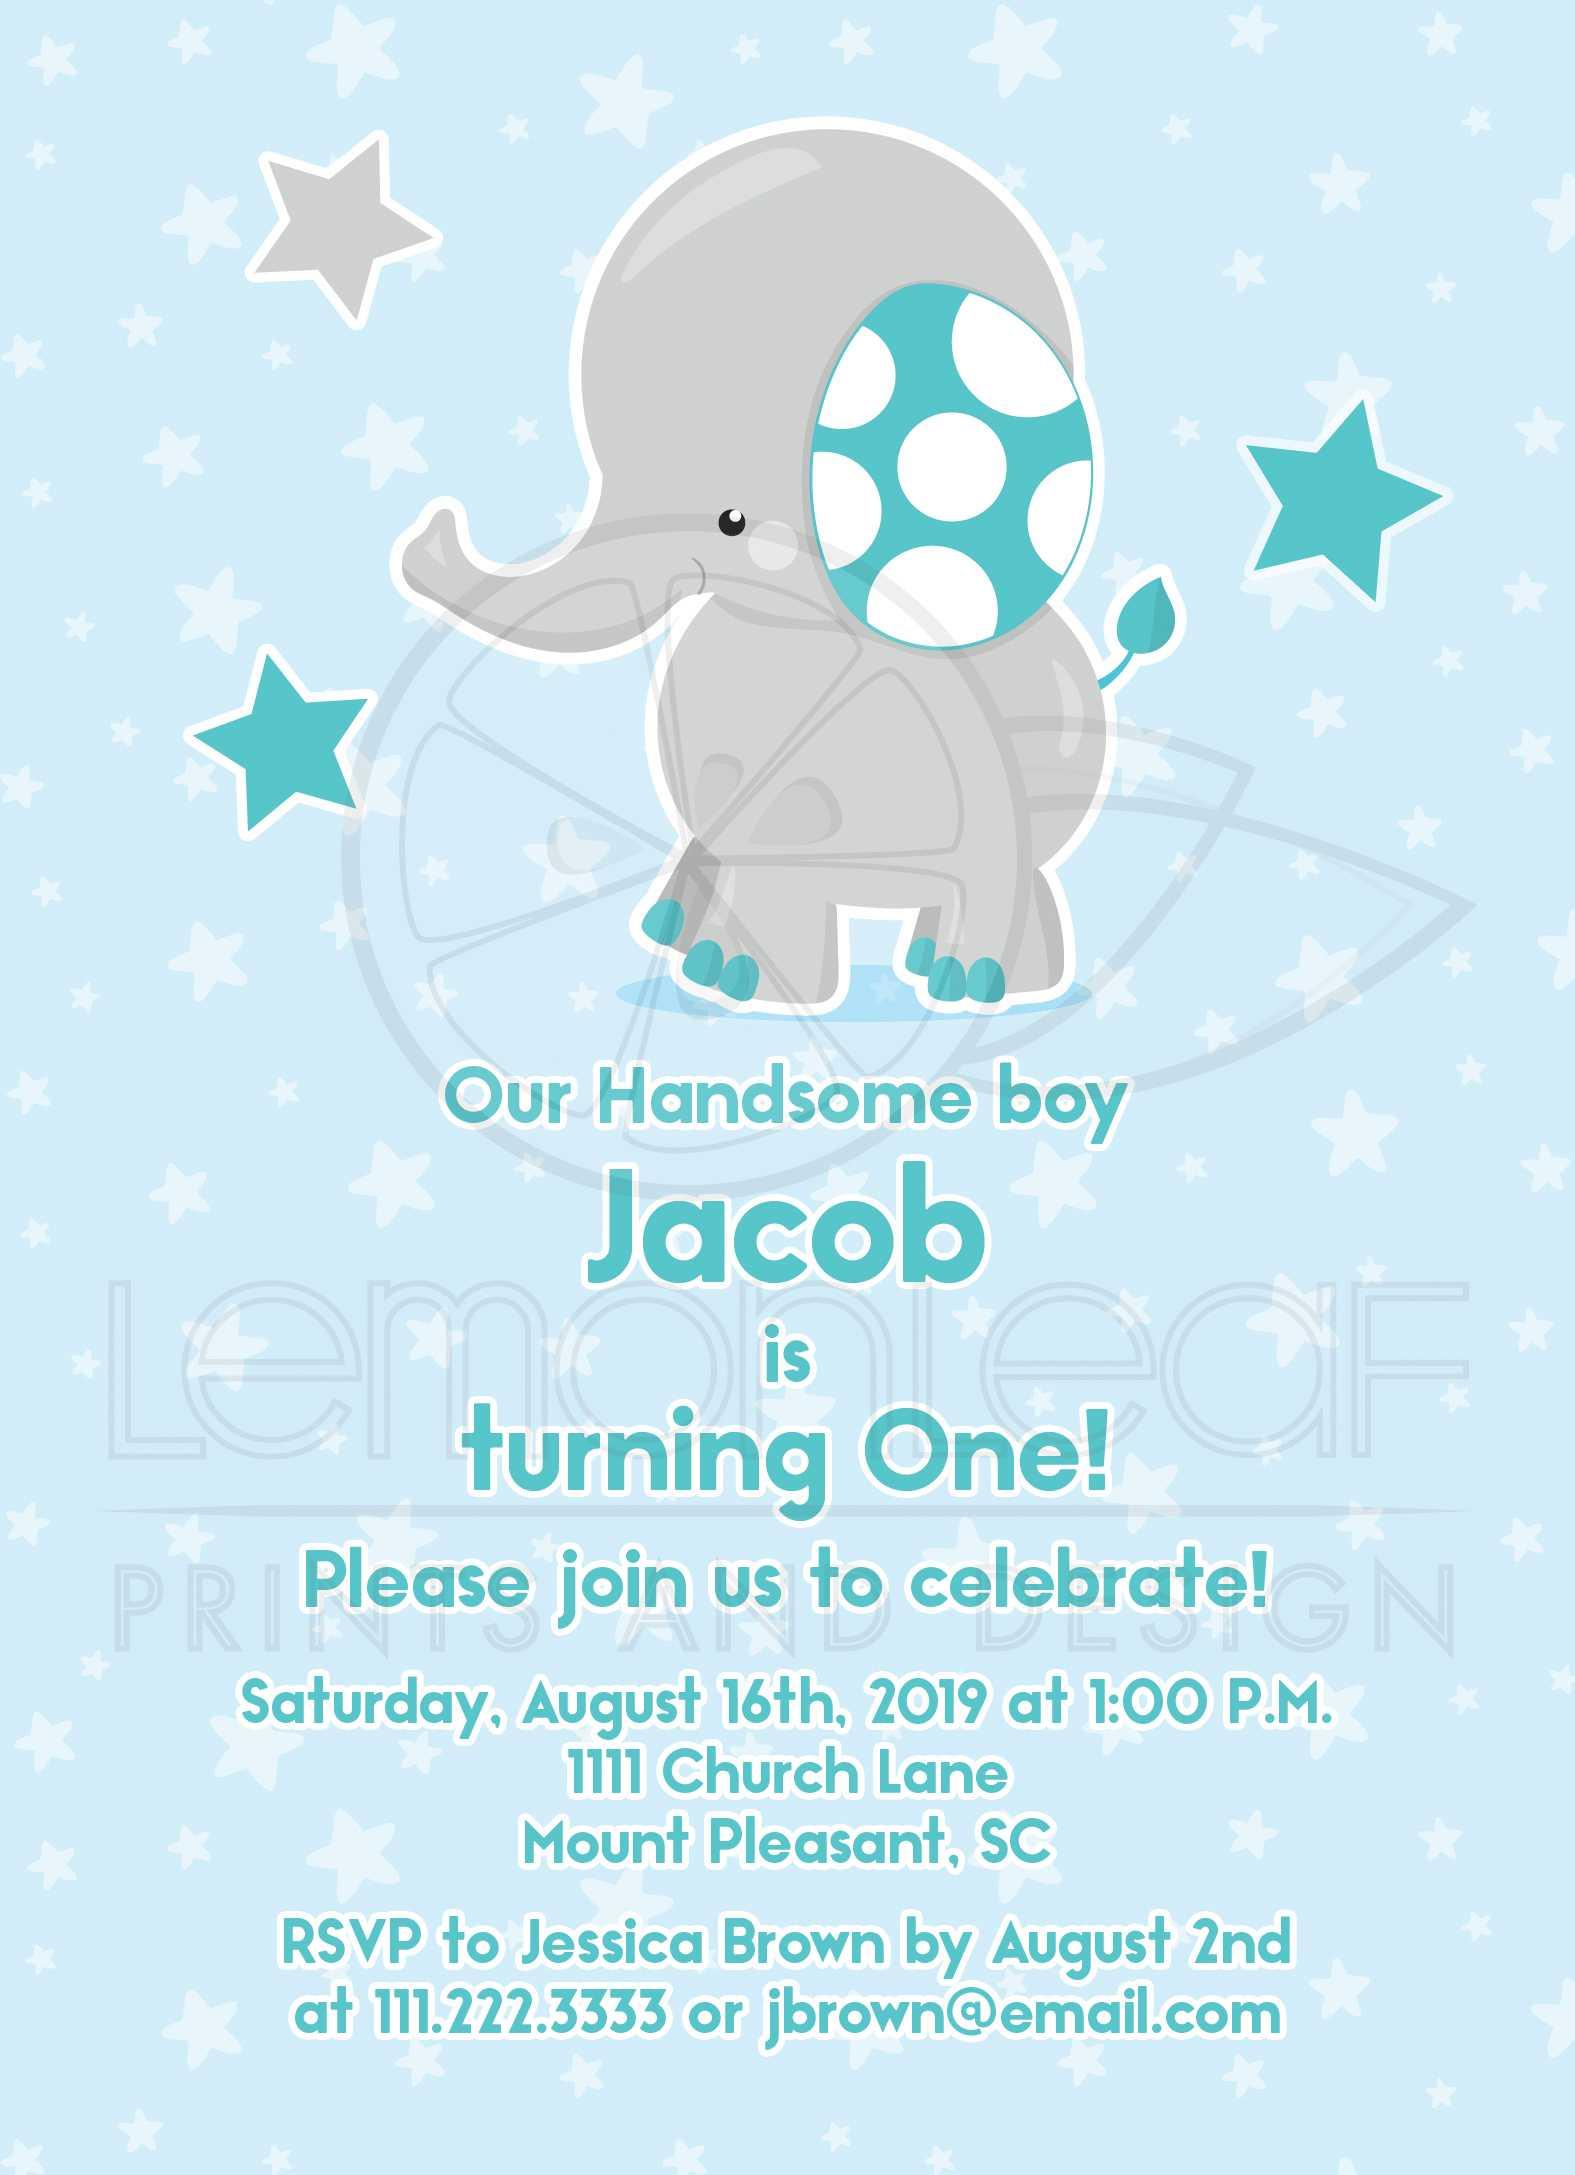 Cute Elephant 20st Birthday Invitation Teal Gray